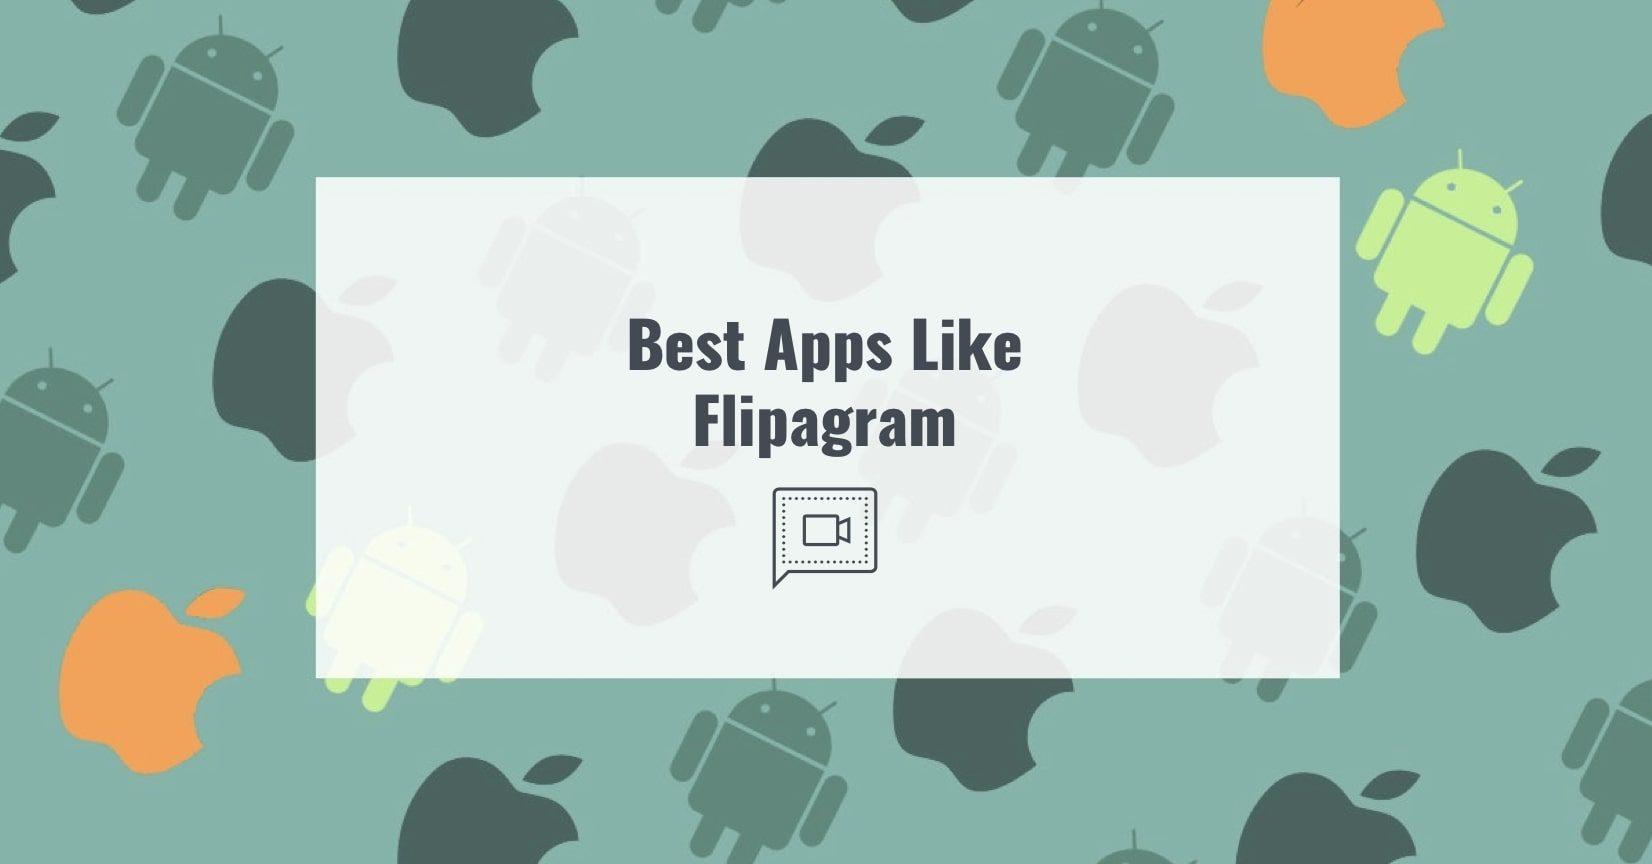 Best-Apps-Like-Flipagram-